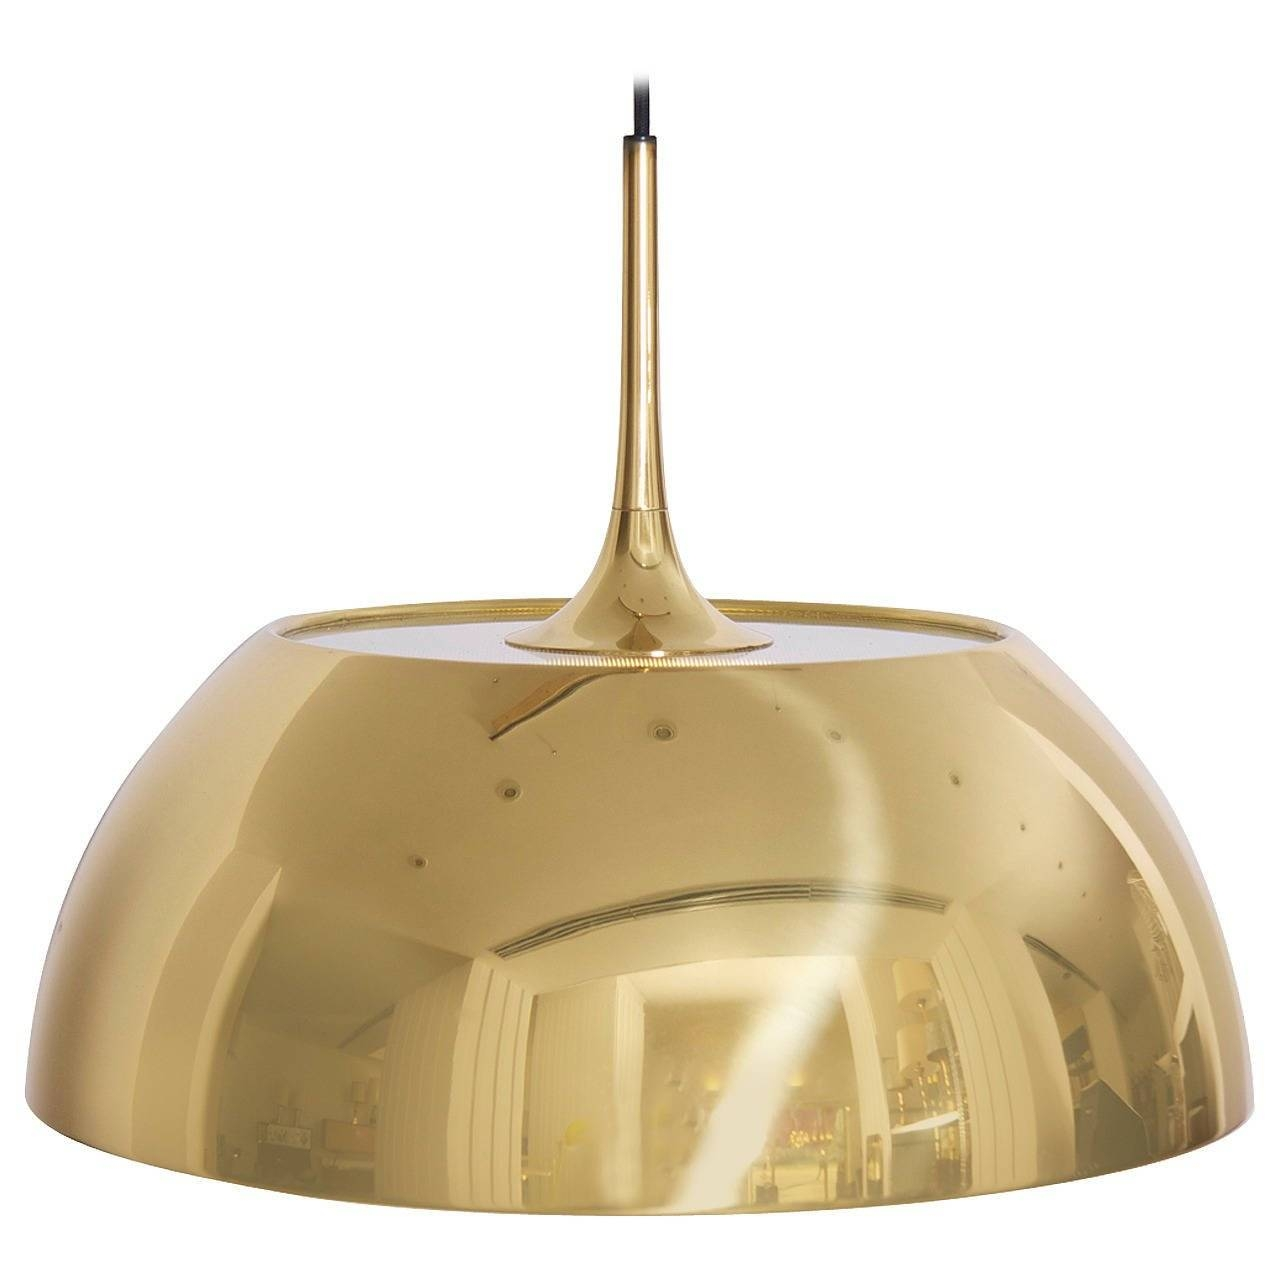 Florian Schulz Brass Ceos 40 Counterweight Pendant Lamp At 1Stdibs with Counterweight Pendant Lights (Image 5 of 15)